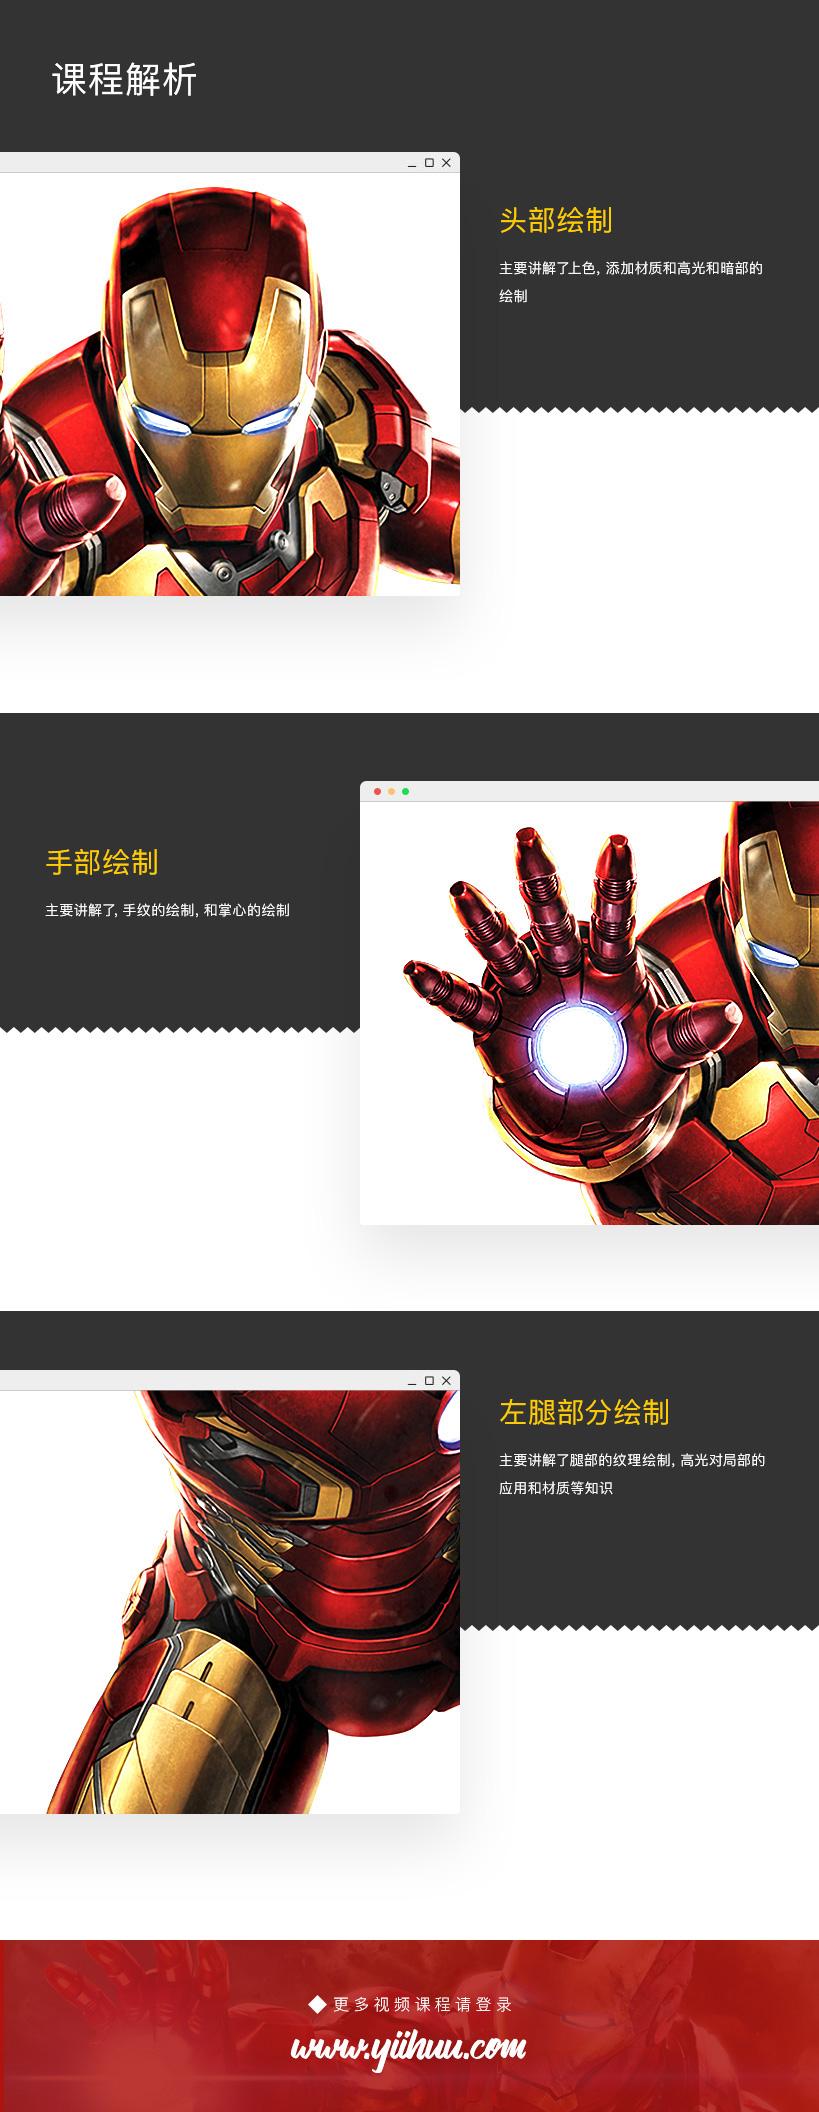 Photoshop超写实钢铁侠案例实战教程